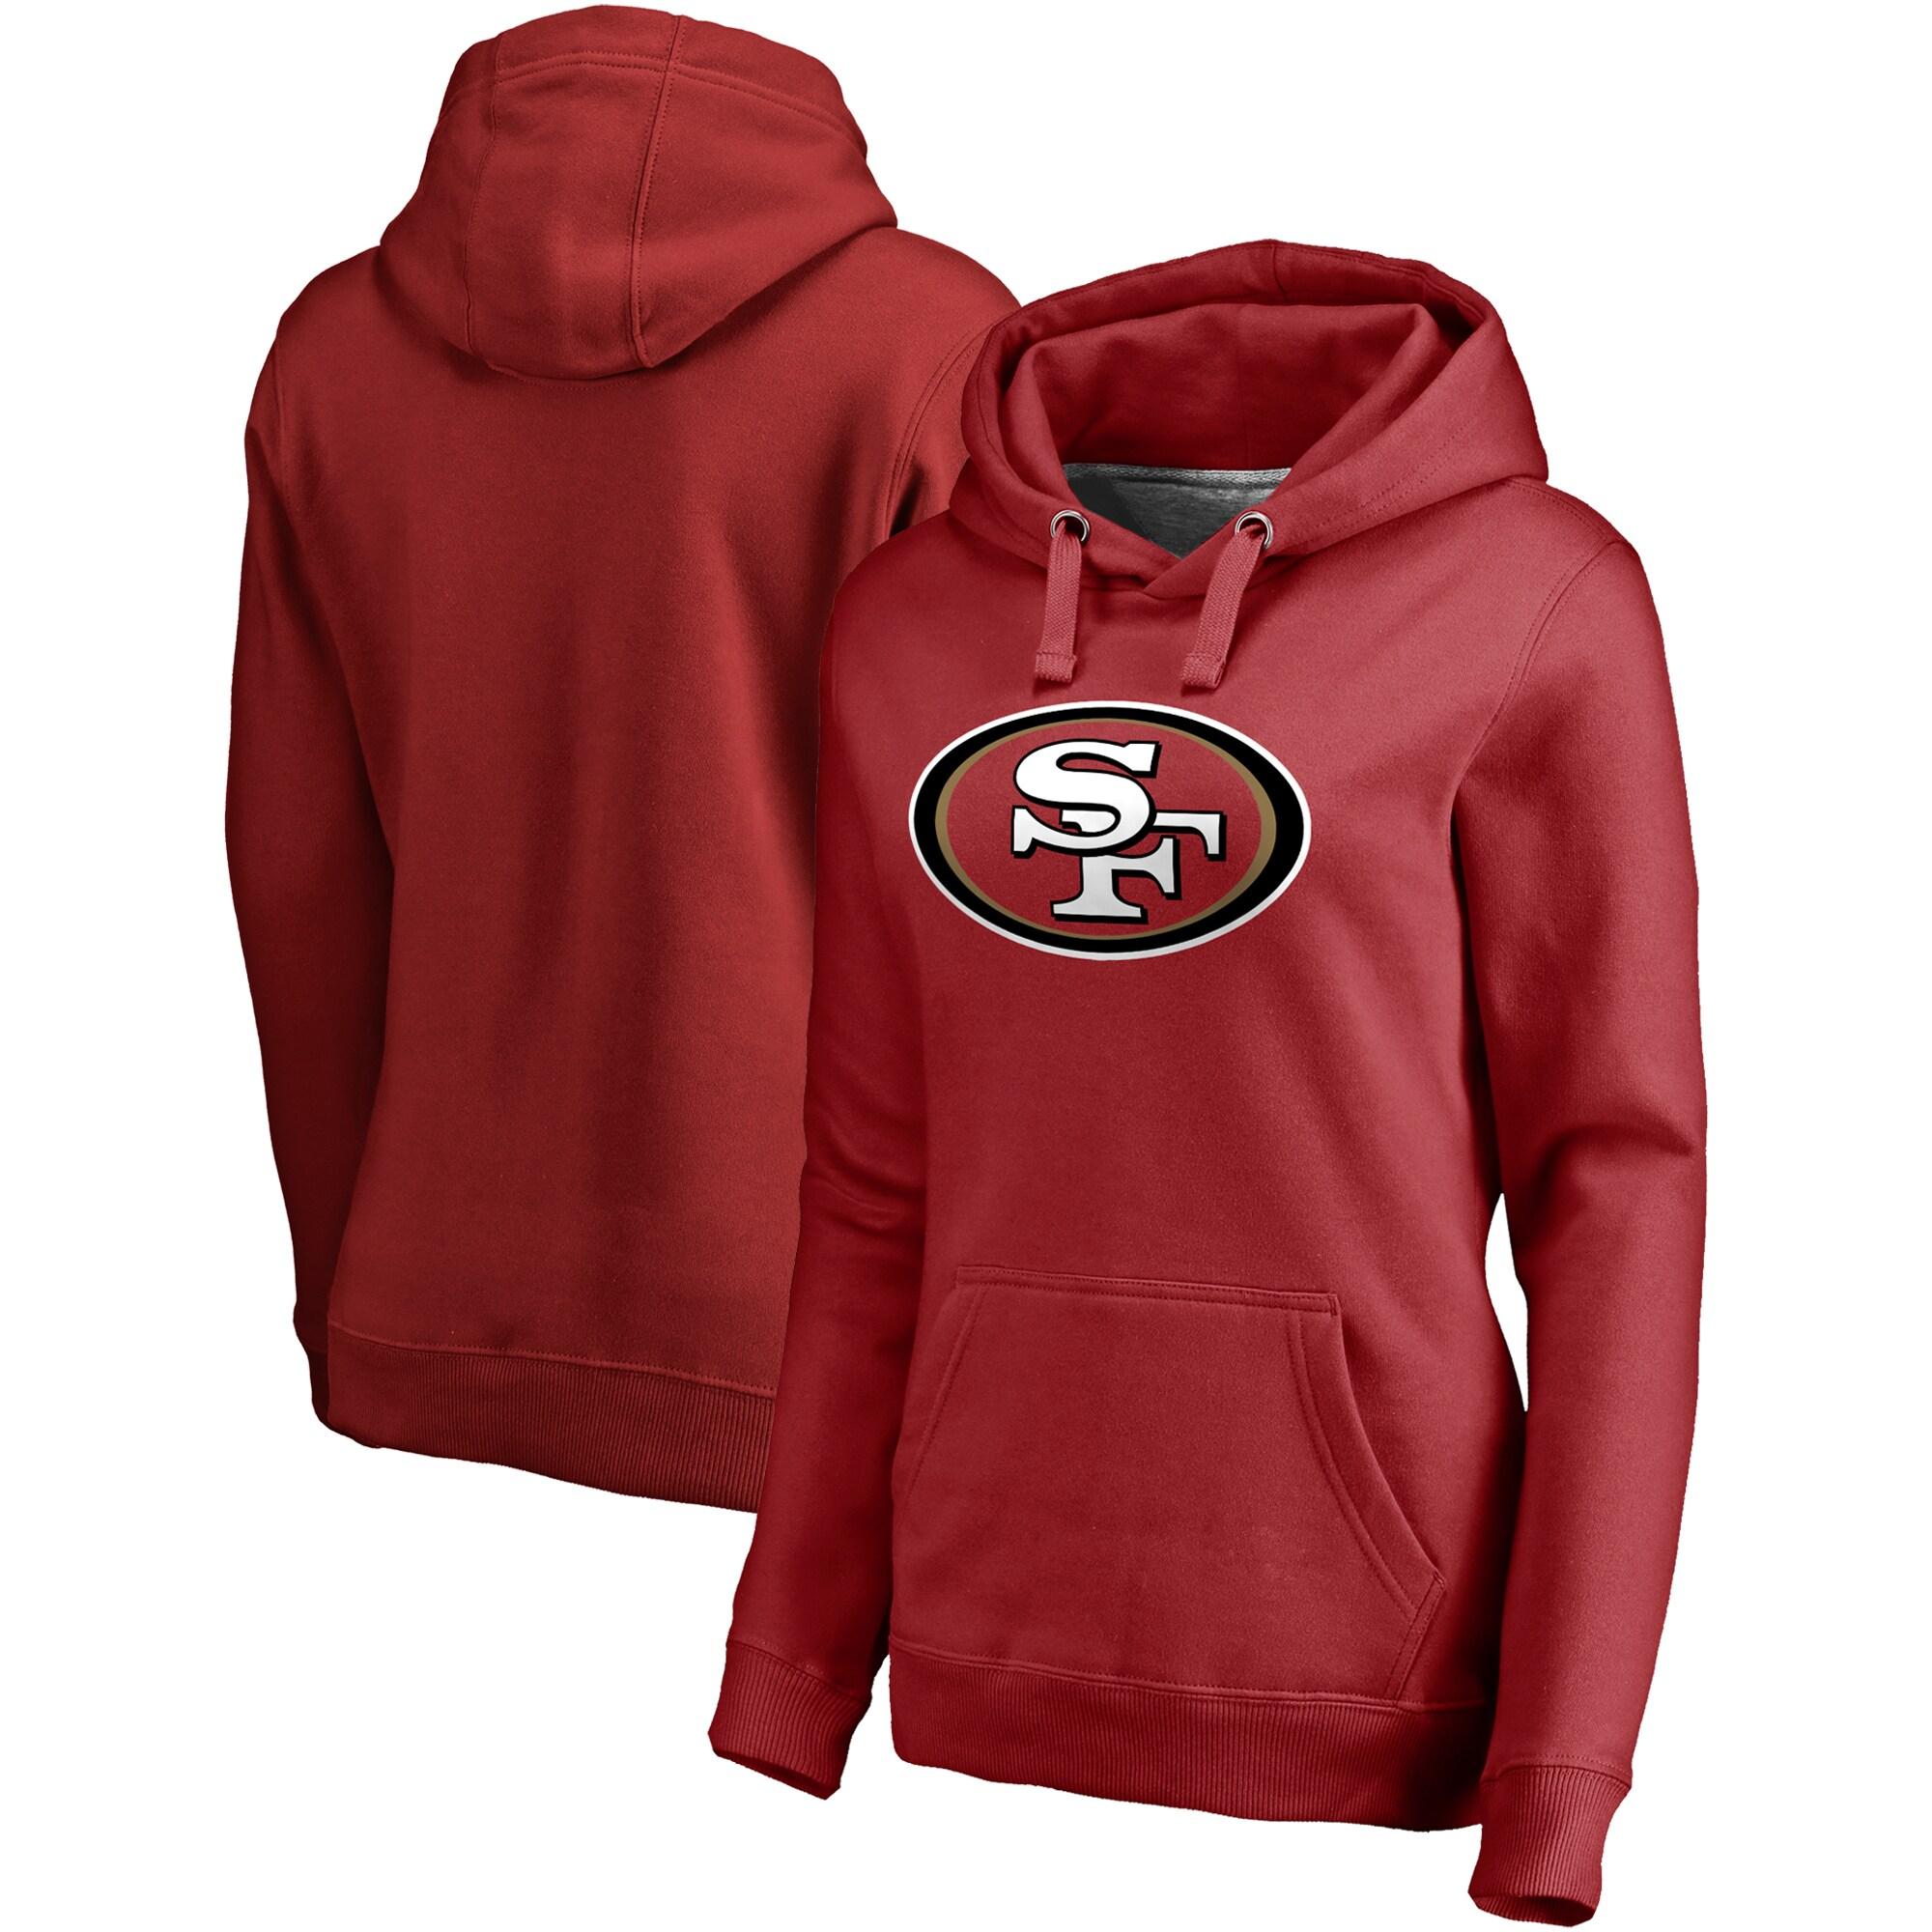 San Francisco 49ers NFL Pro Line Women's Primary Team Logo Pullover Hoodie - Scarlet